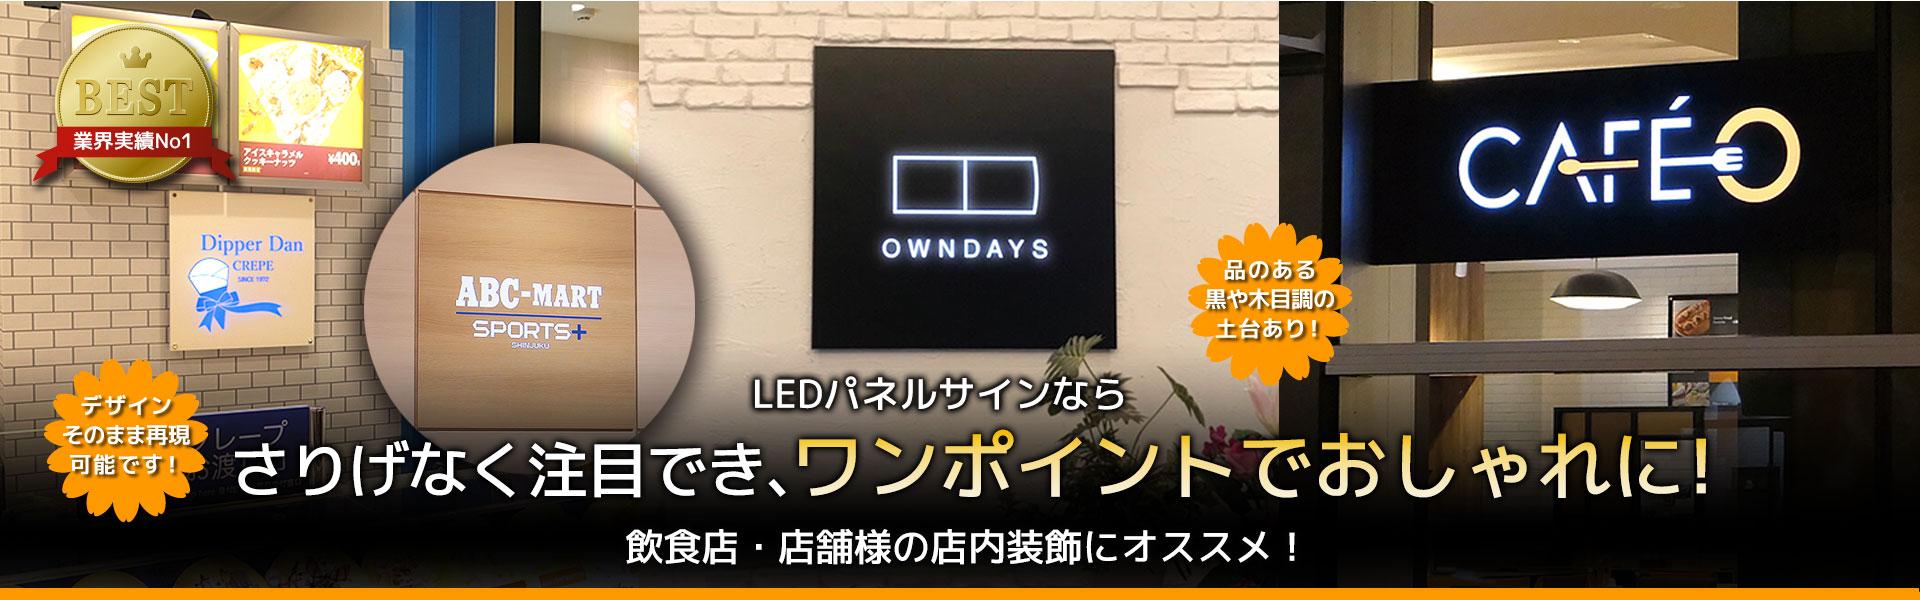 LEDパネルサインの制作販売ならお任せ下さい 店舗集客 LED看板